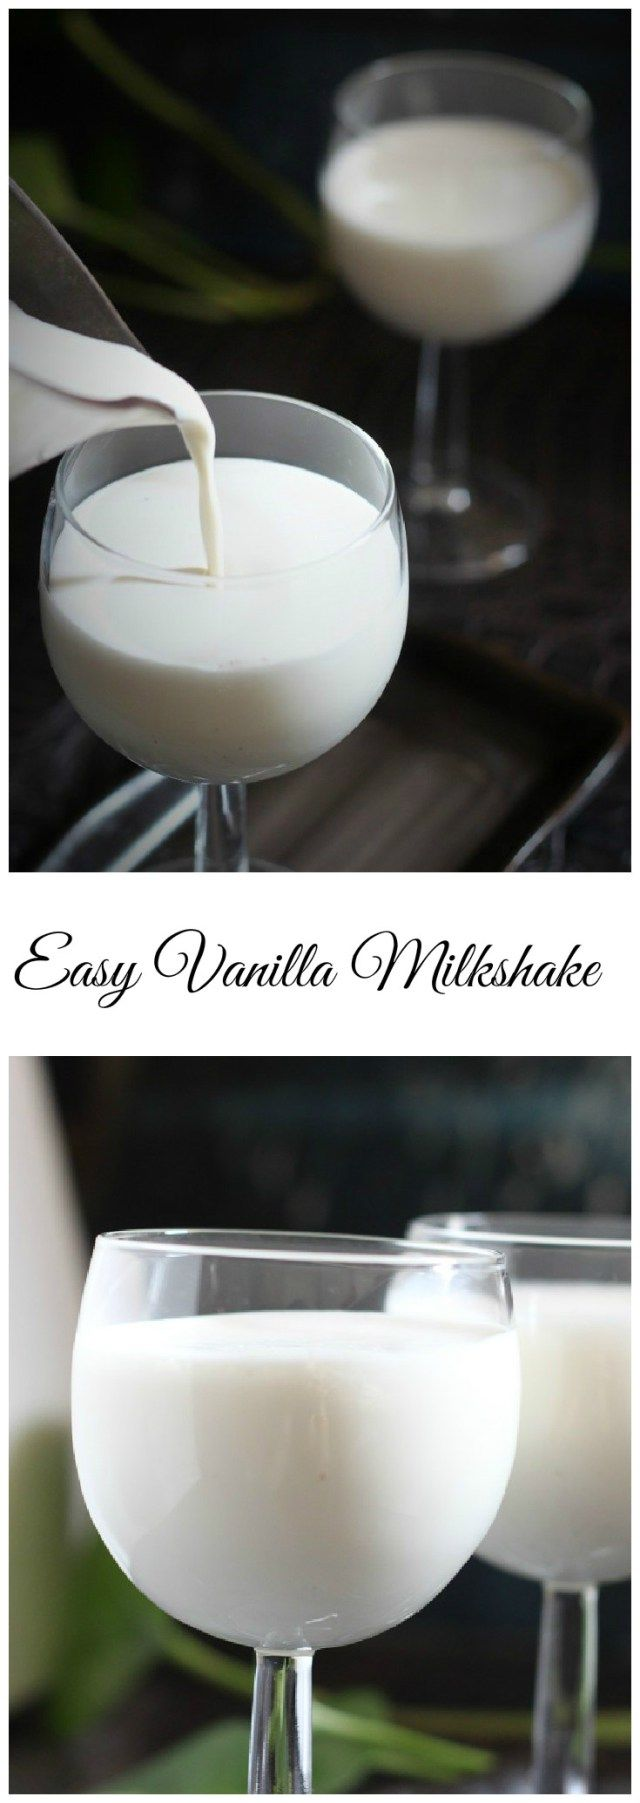 4 ingredient easy and tasty Vanilla Milkshake